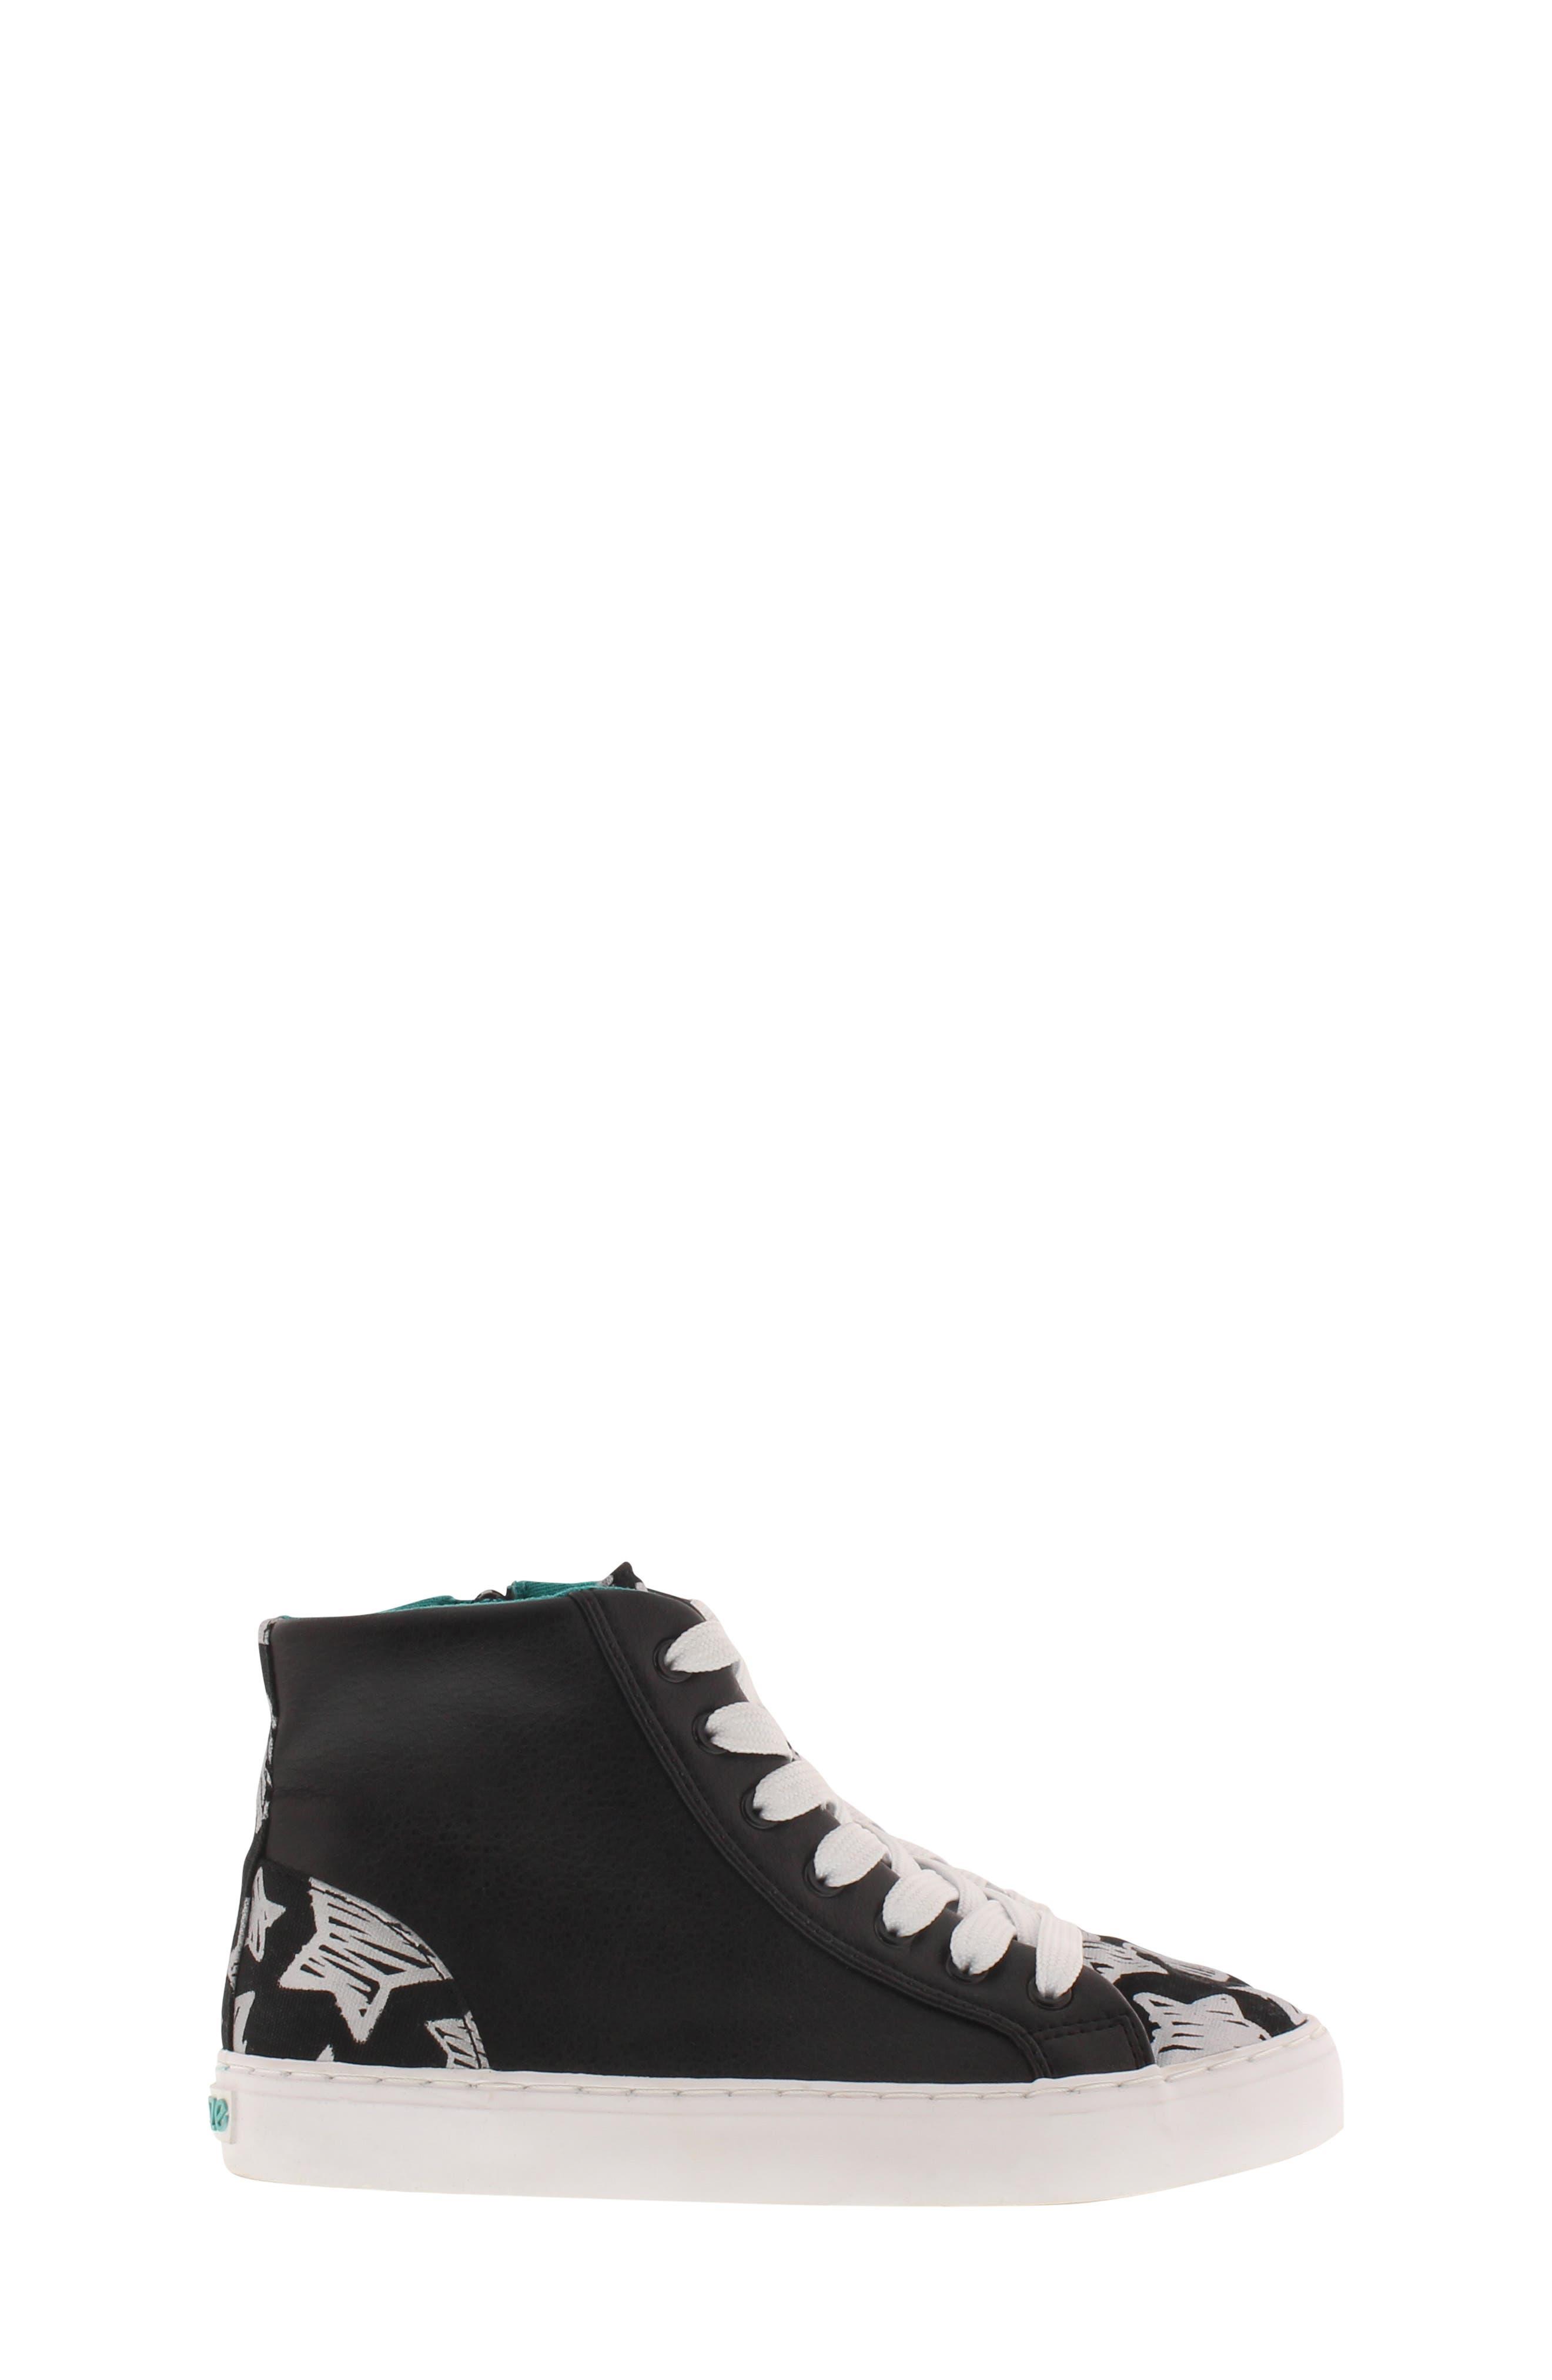 CHOOZE, Uplift Superstar High Top Sneaker, Alternate thumbnail 3, color, BLACK